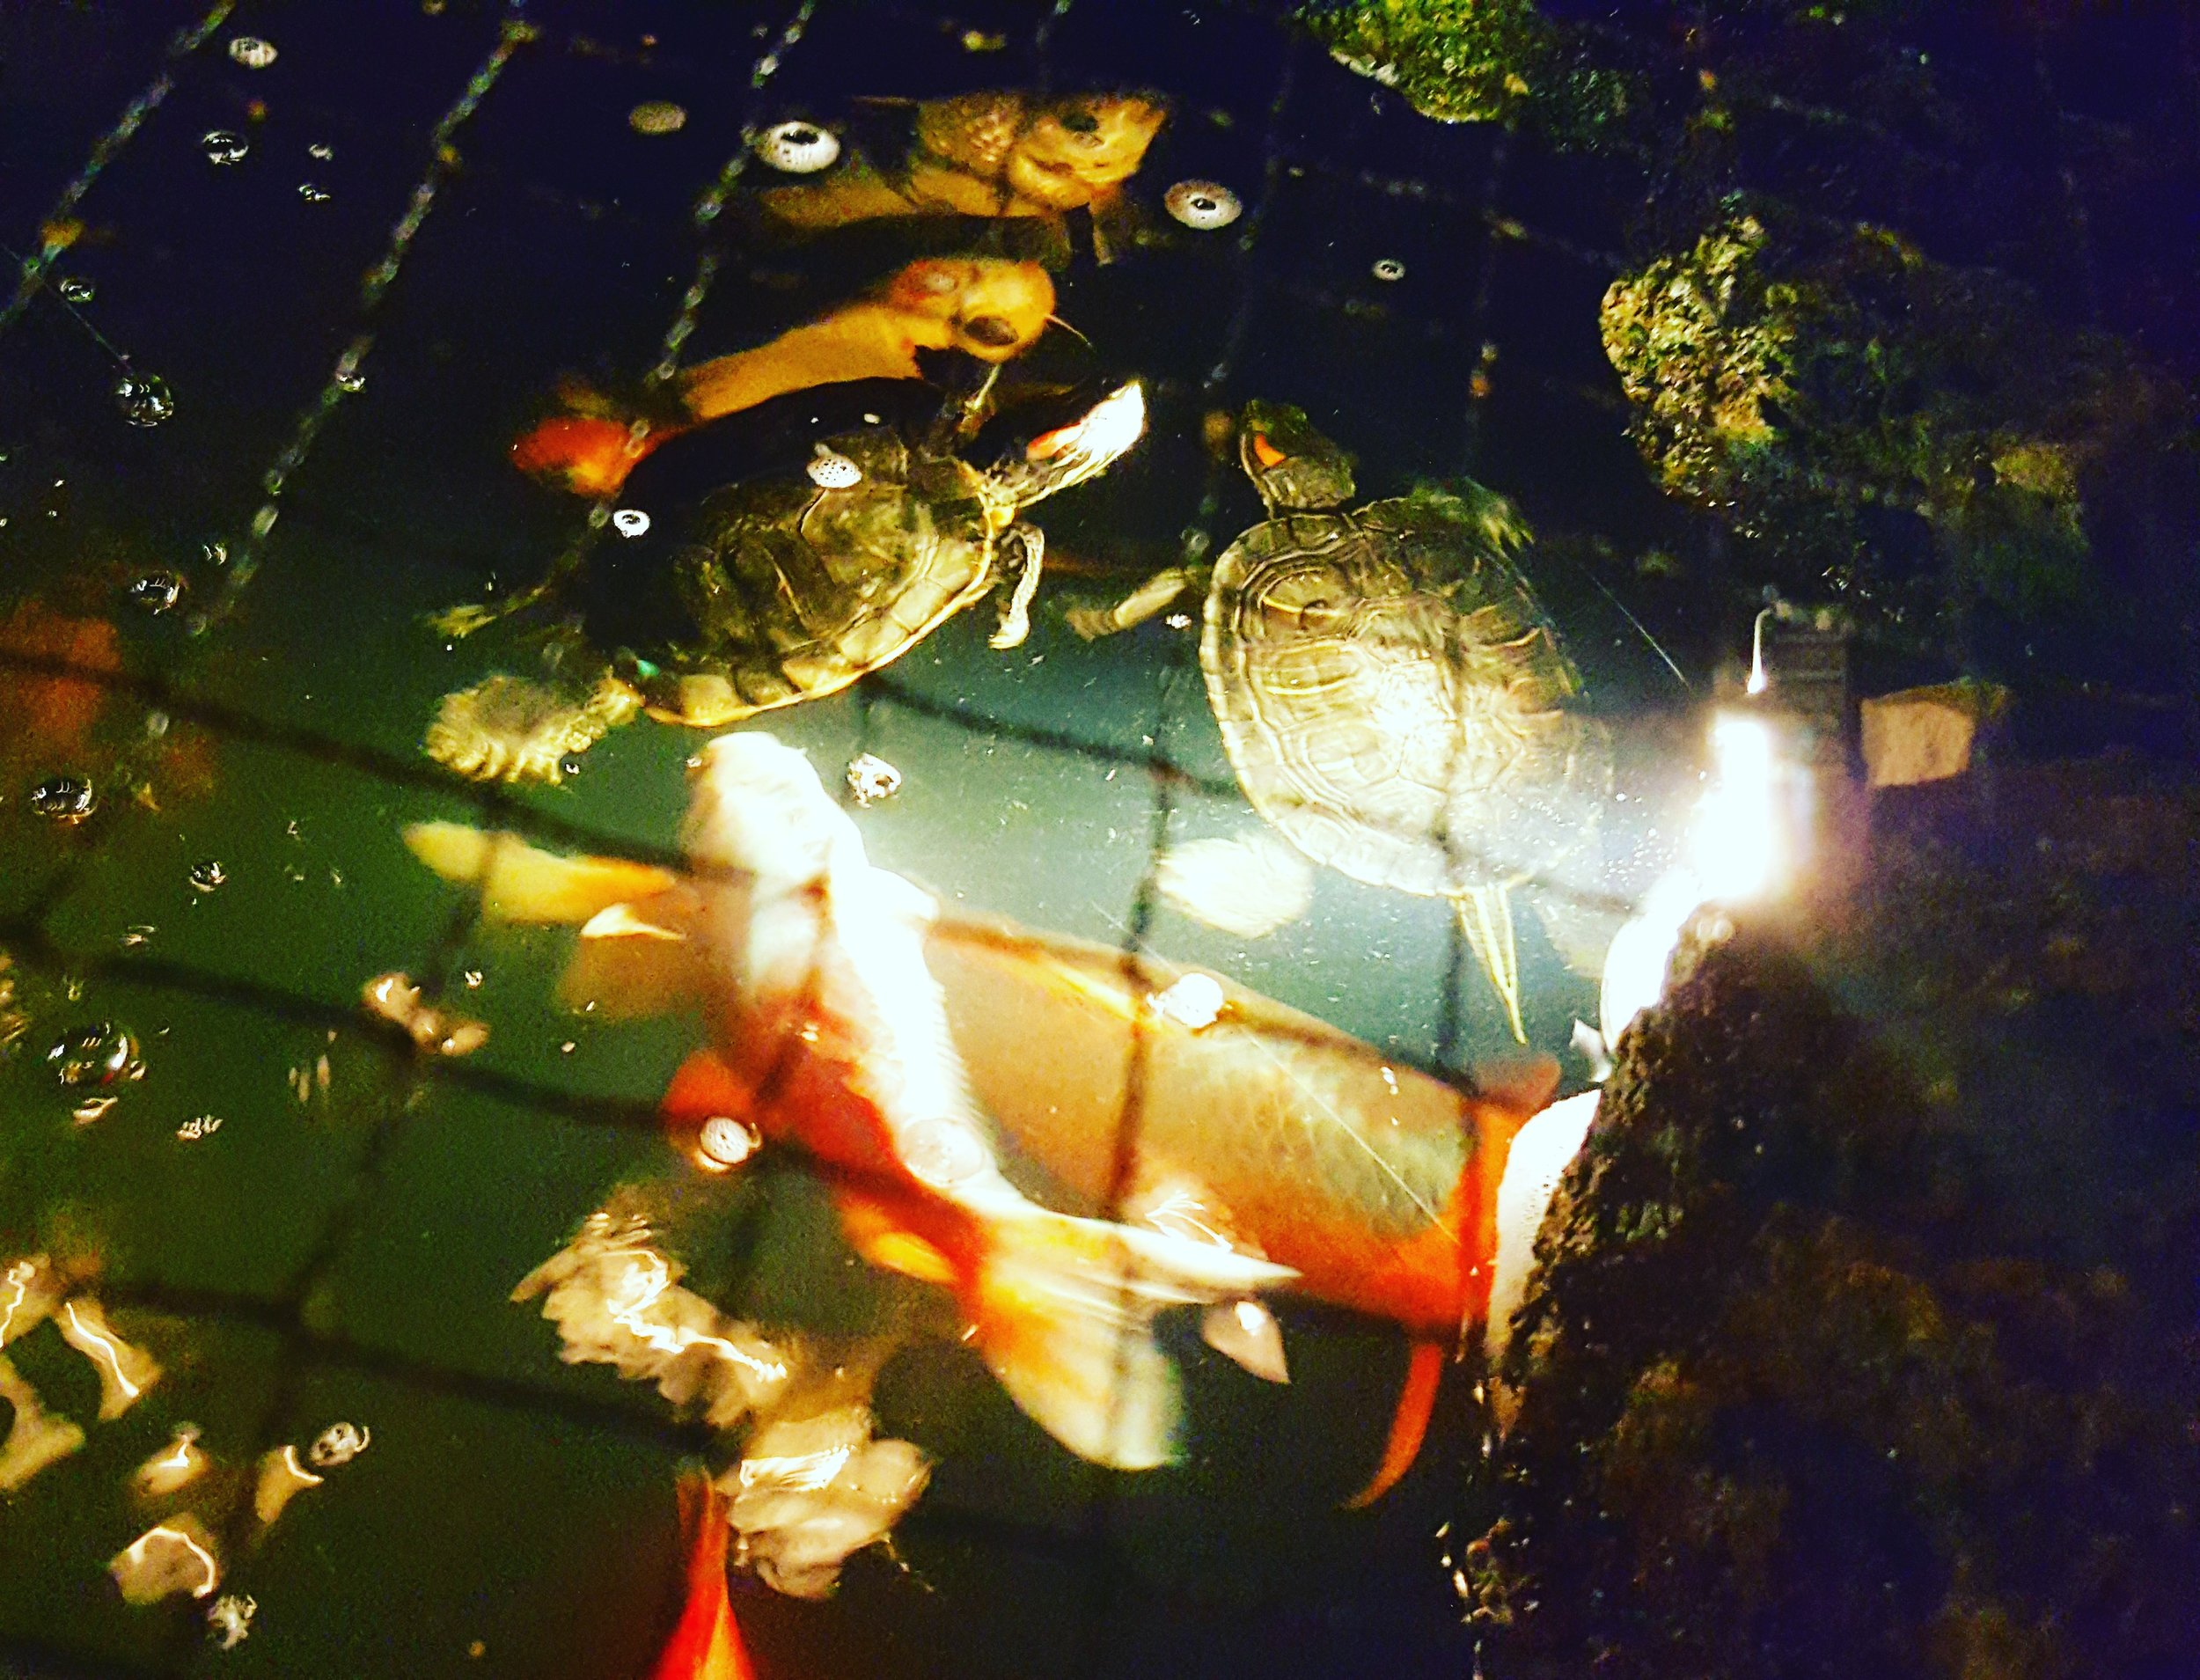 Turtles Bodhi&FBIAgentJohnnyUtah.jpg